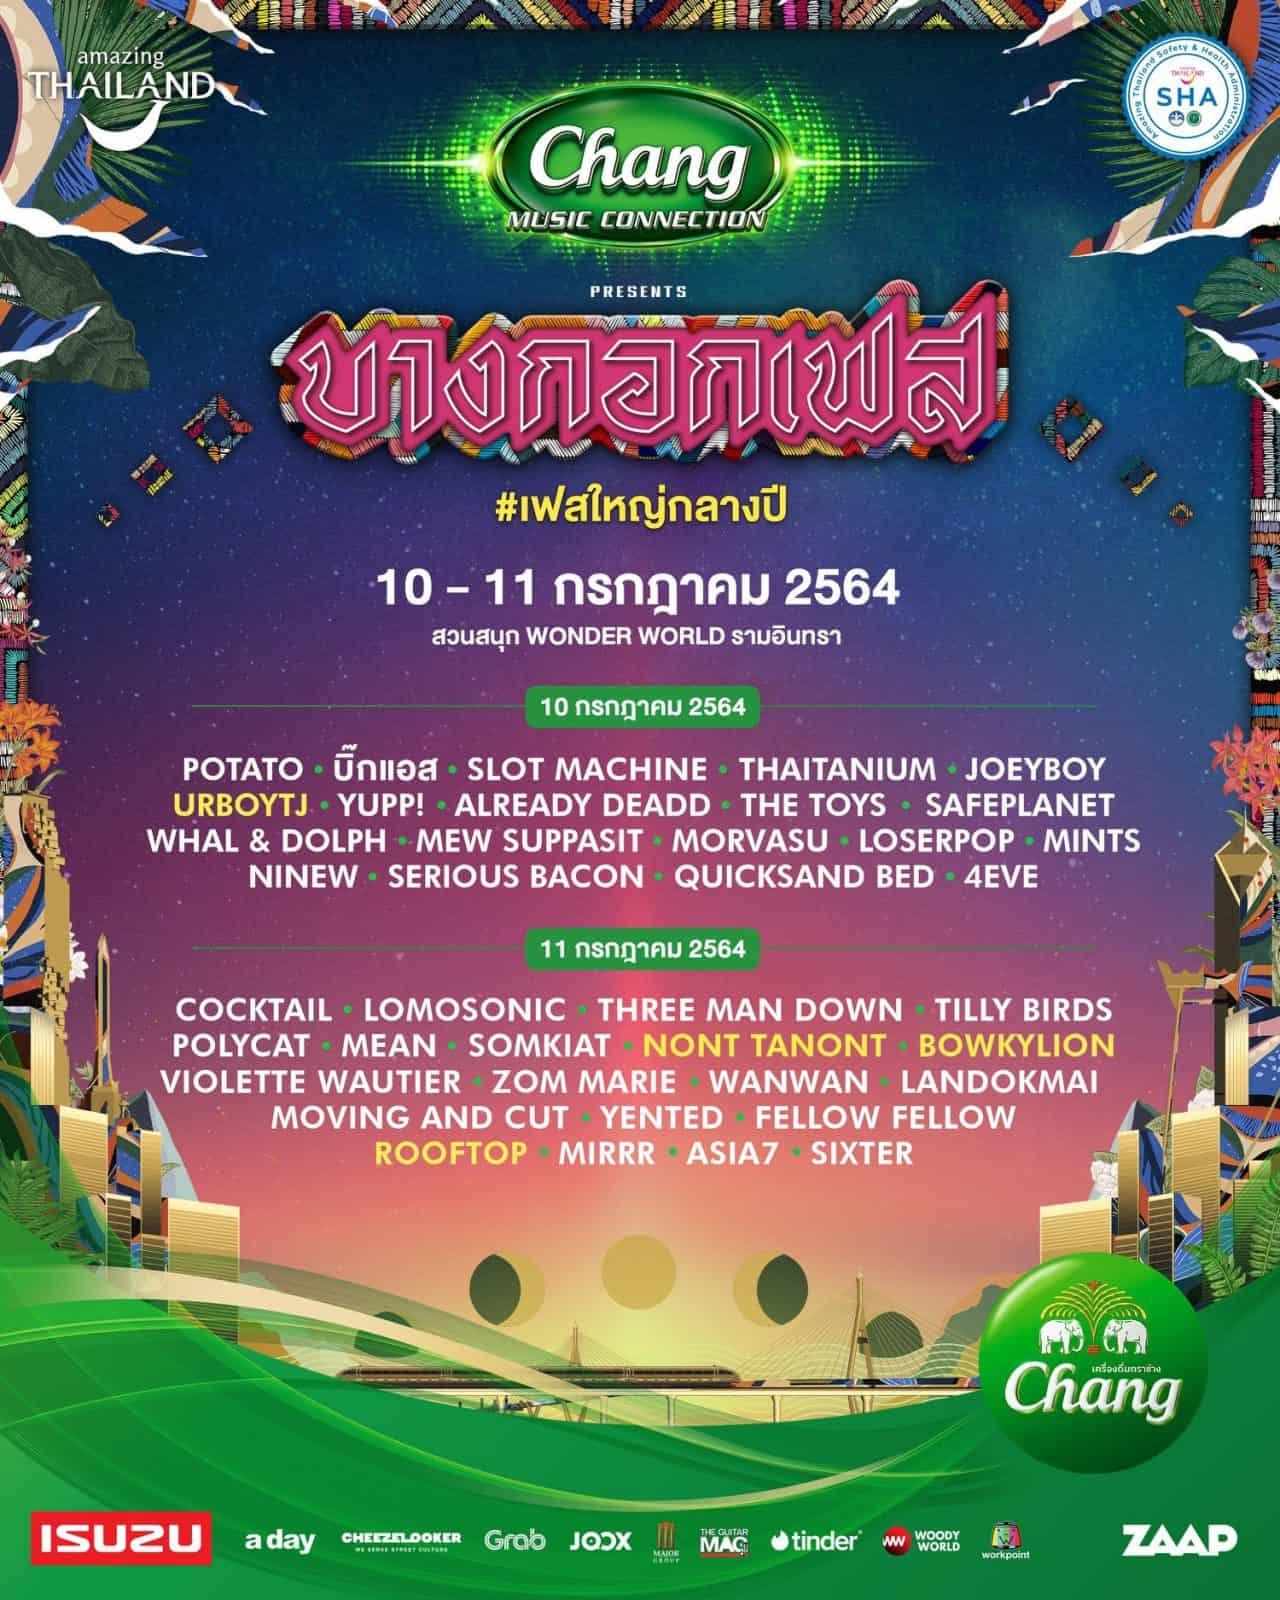 "Bangkok Fest เลื่อนงาน ""บางกอกเฟส"" ไปเป็นวันที่ 10 - 11 กรกฏาคม 2564"